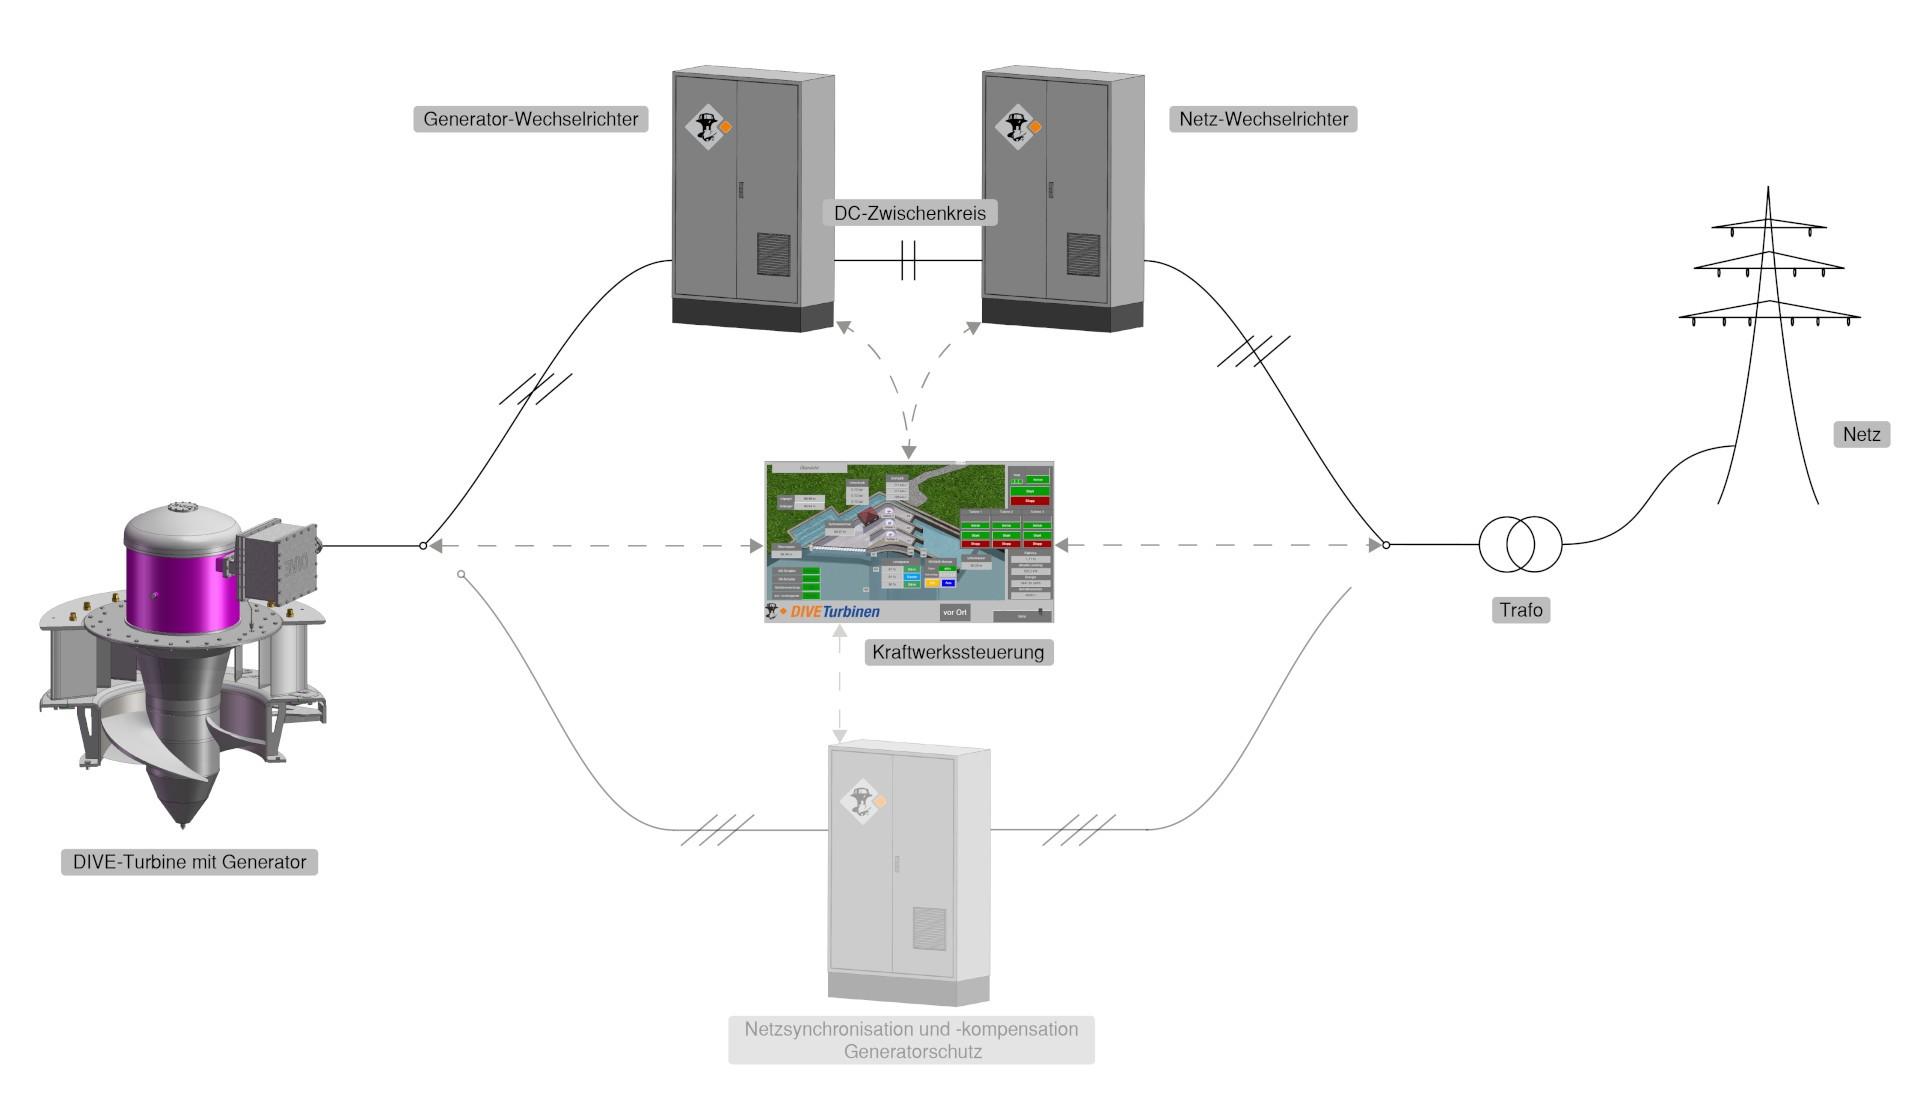 DIVE-Turbine_Regelung_nVar_I.jpg